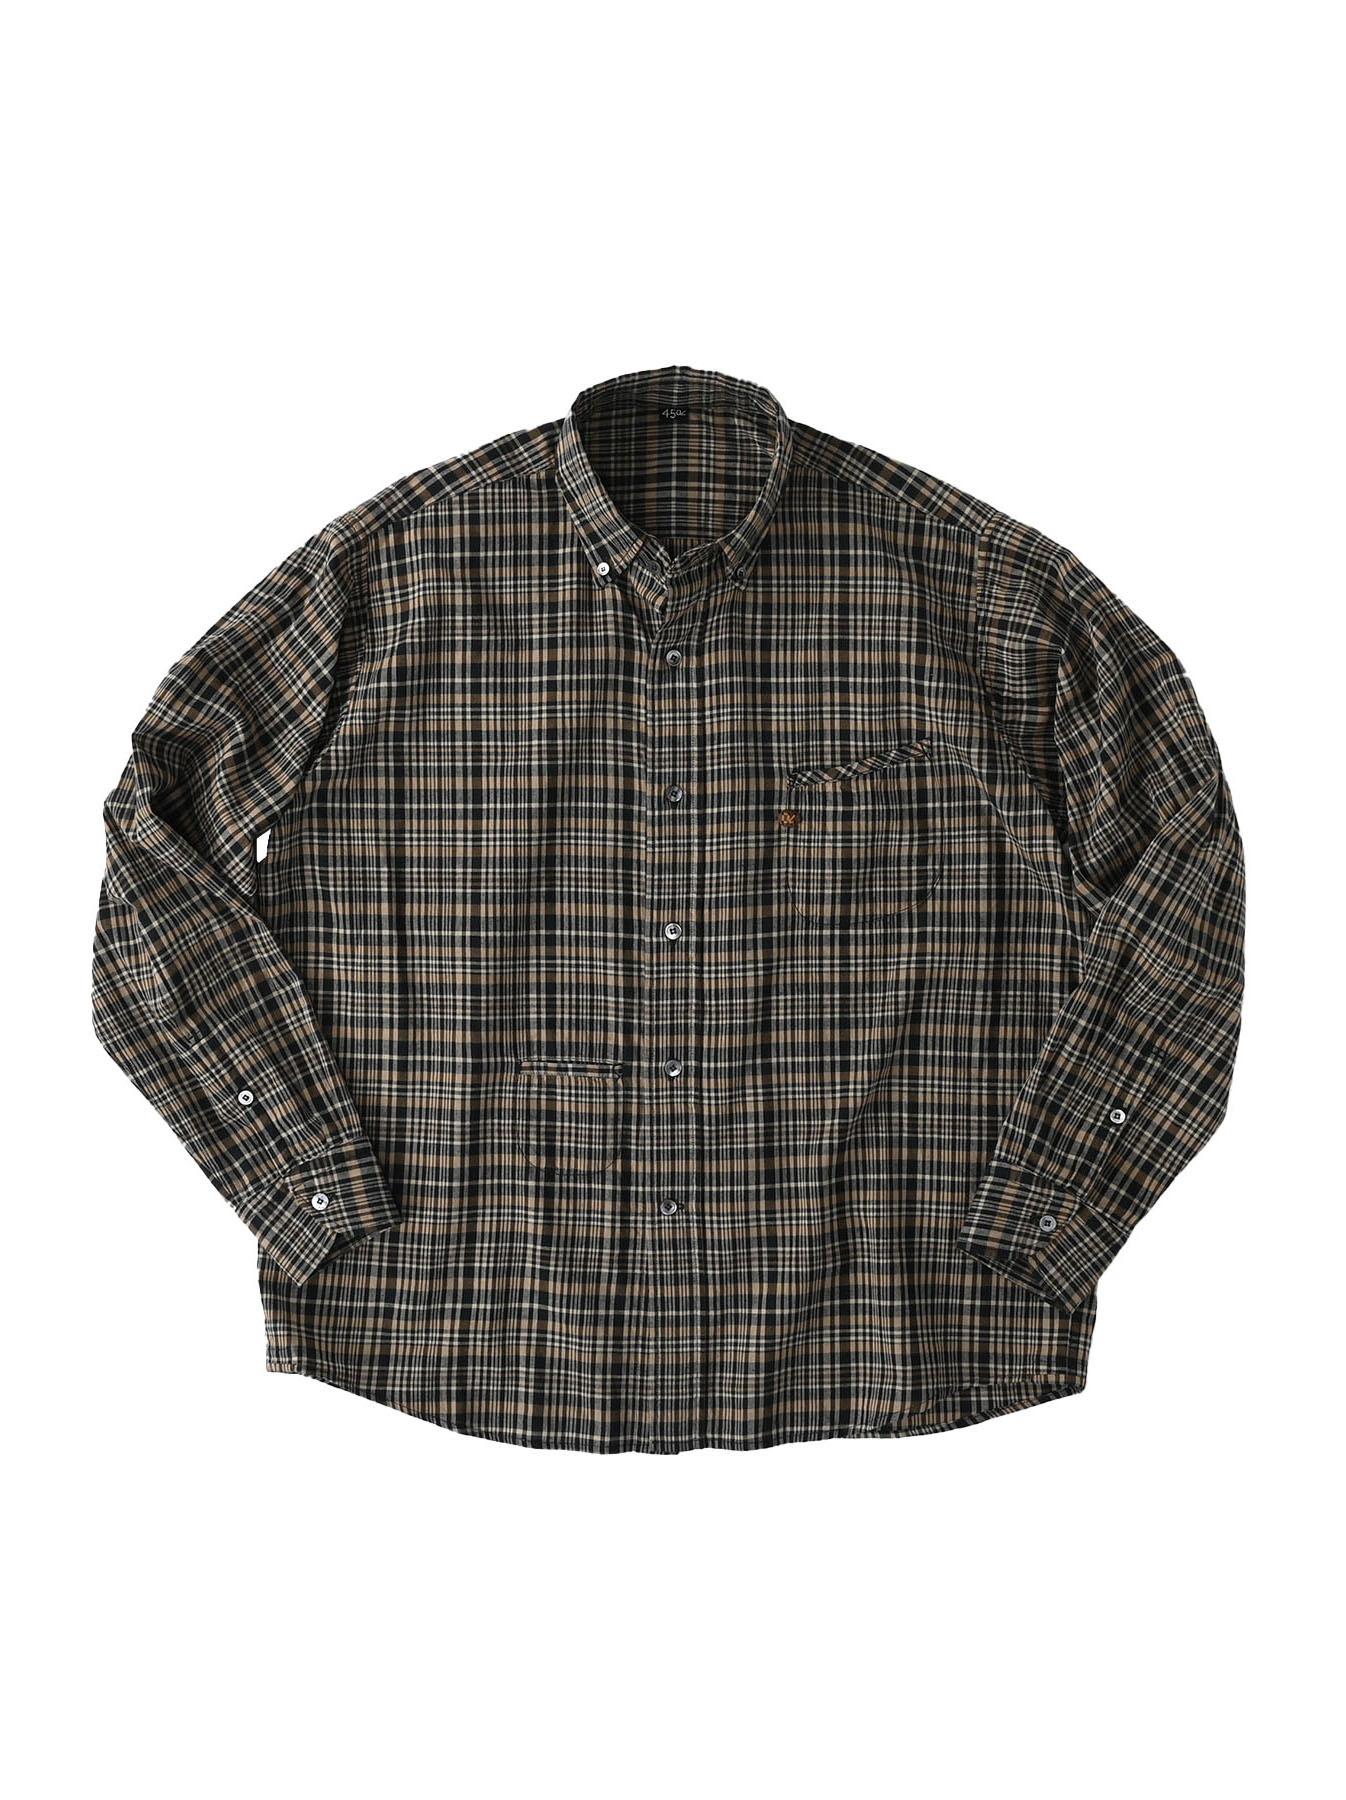 Indian Mugi-hira 908 Ocean Button Down Shirt (0421)-1